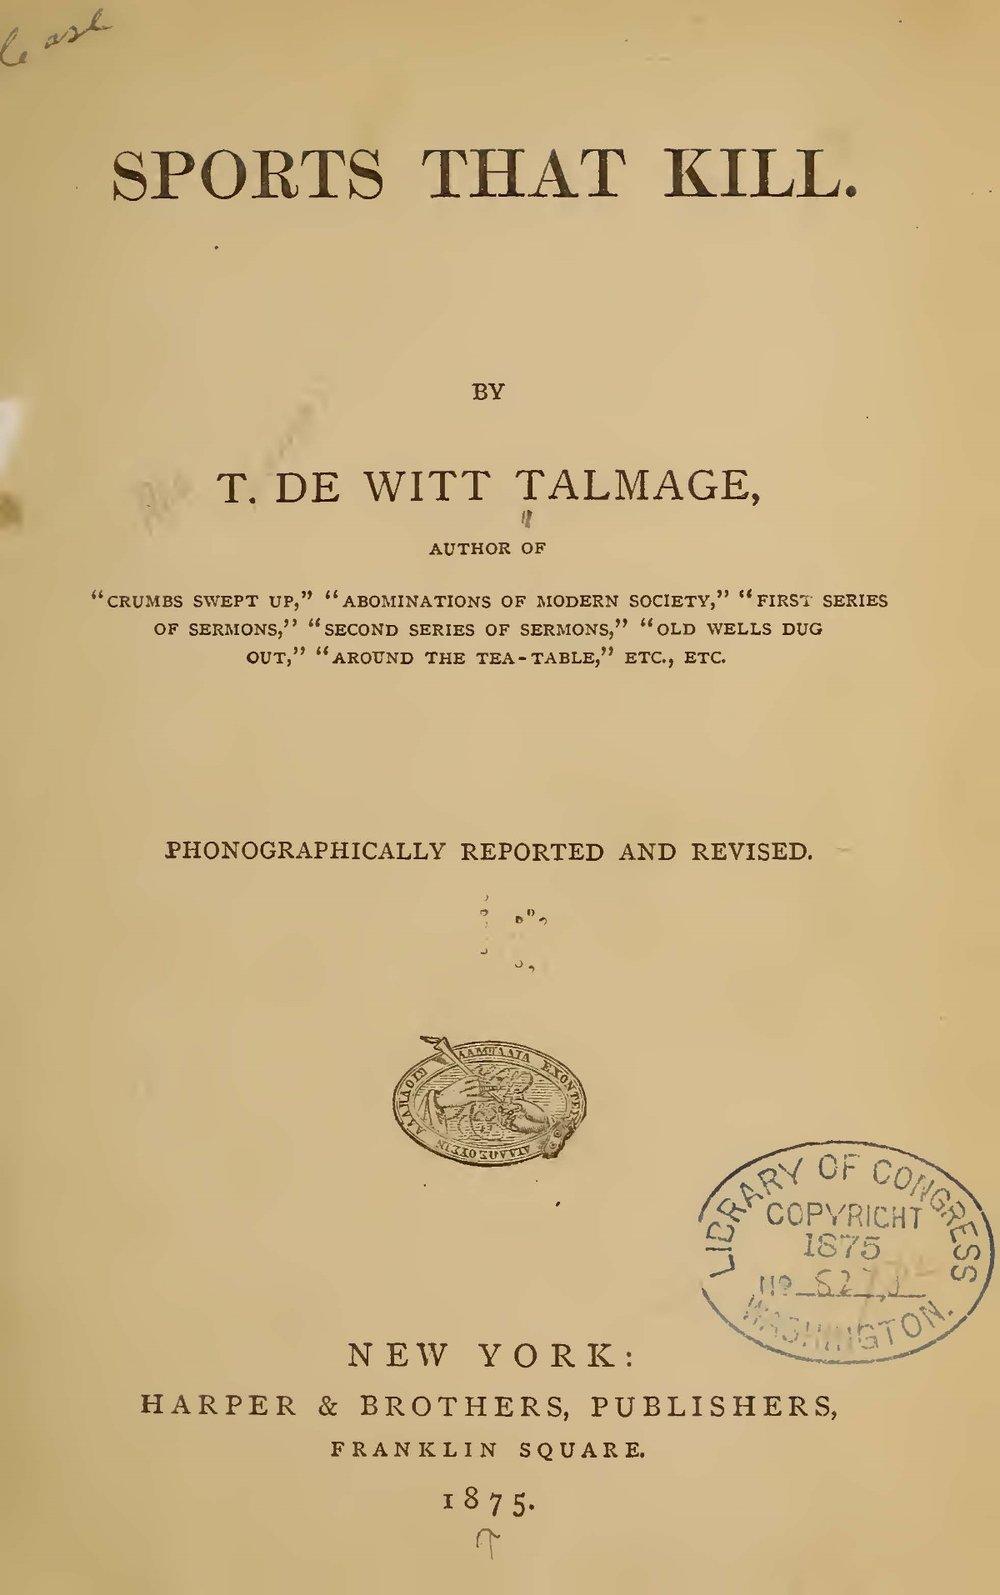 Talmage, Thomas De Witt, Sports That Kill Title Page.jpg